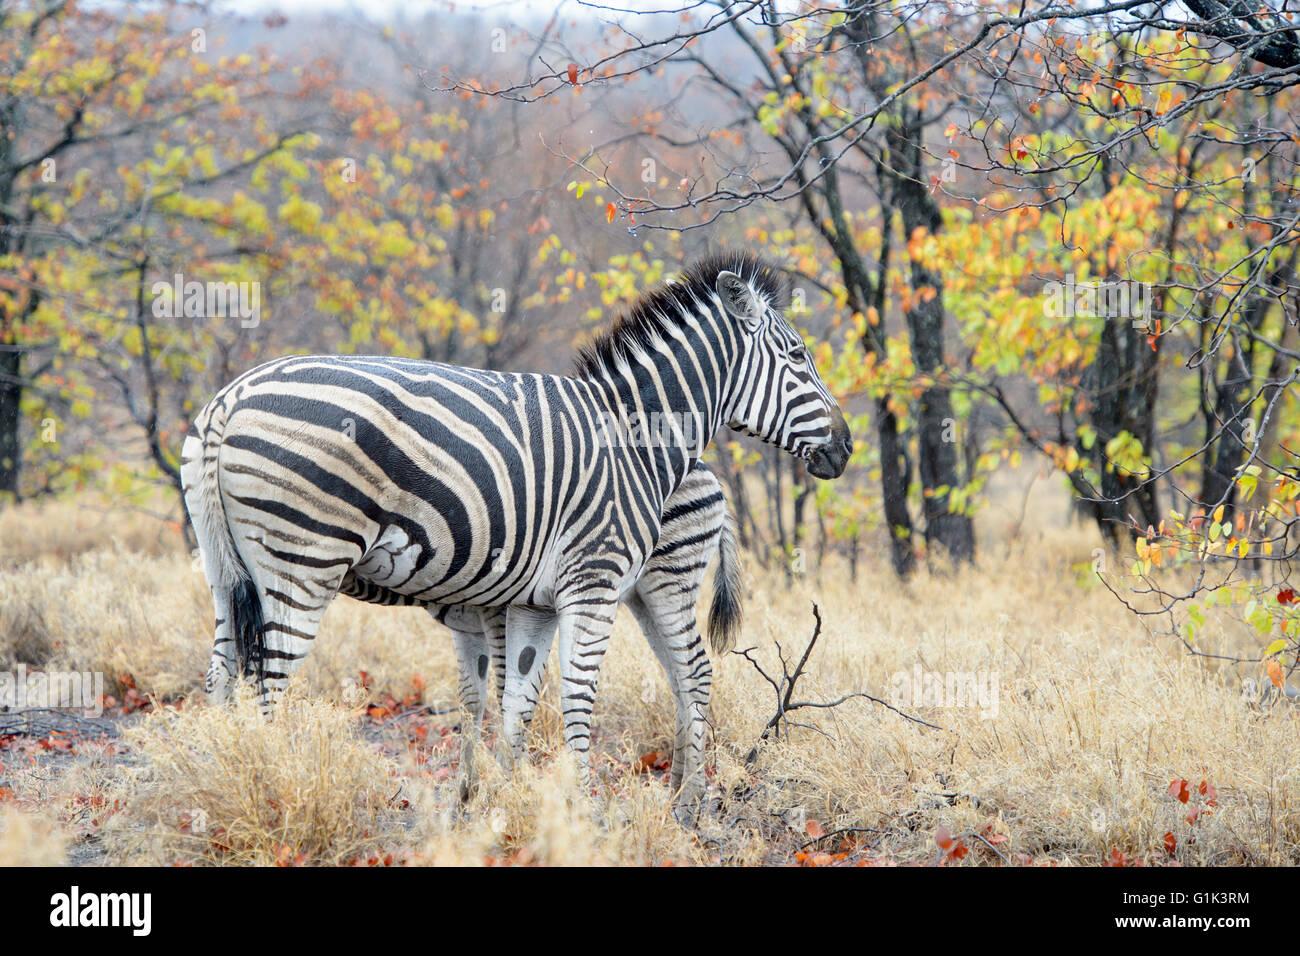 Plains zebra (Equus quagga) juvenile drinking with mother, Kruger National Park, South Africa - Stock Image